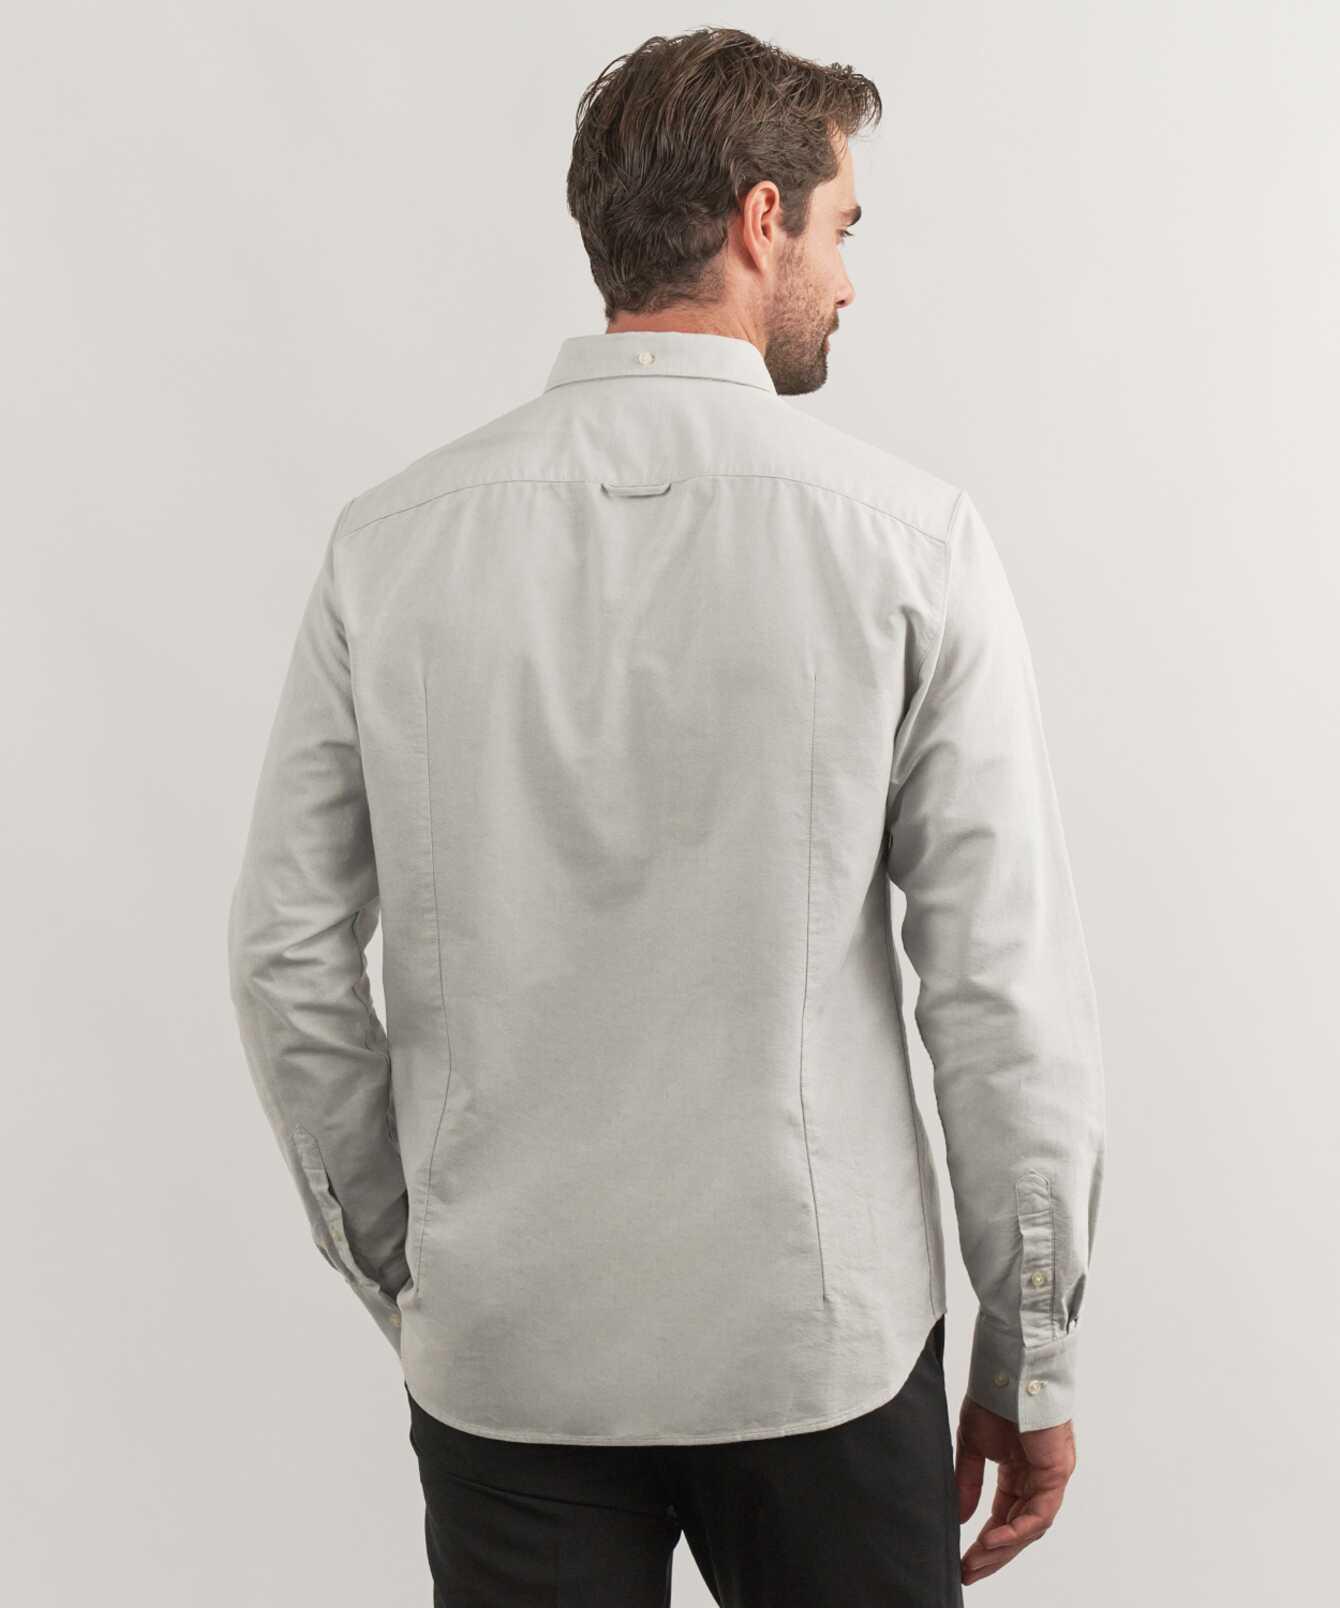 Shirt Boston Oxford Light Grey The Shirt Factory